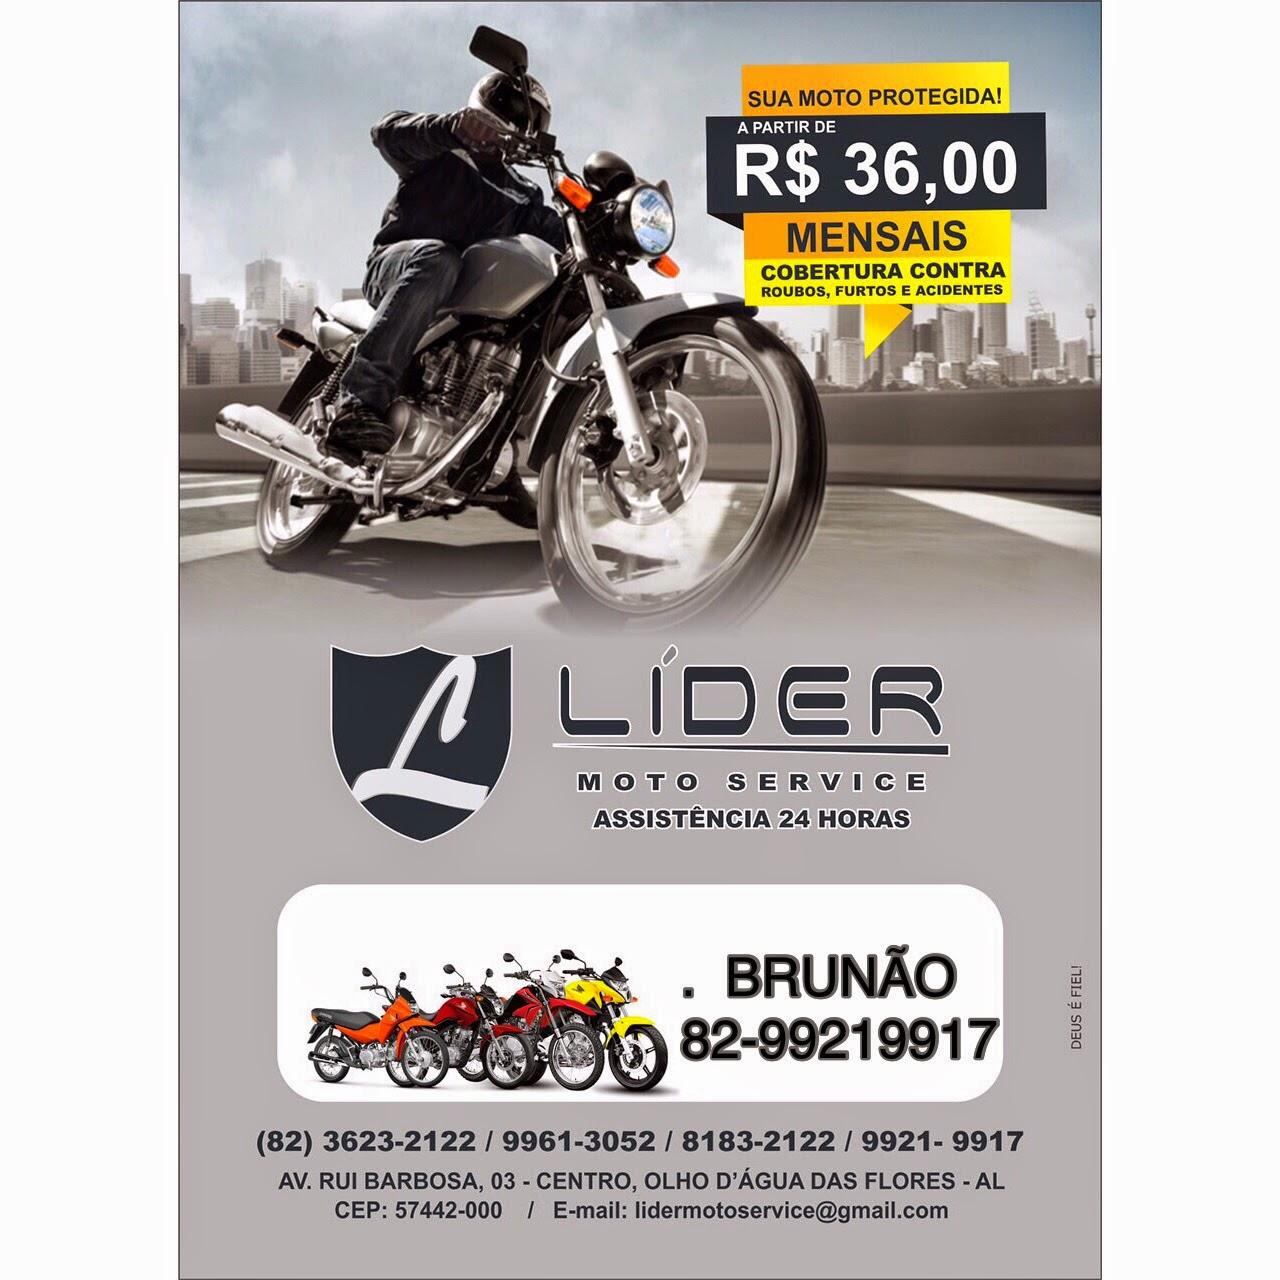 Lider Moto Service